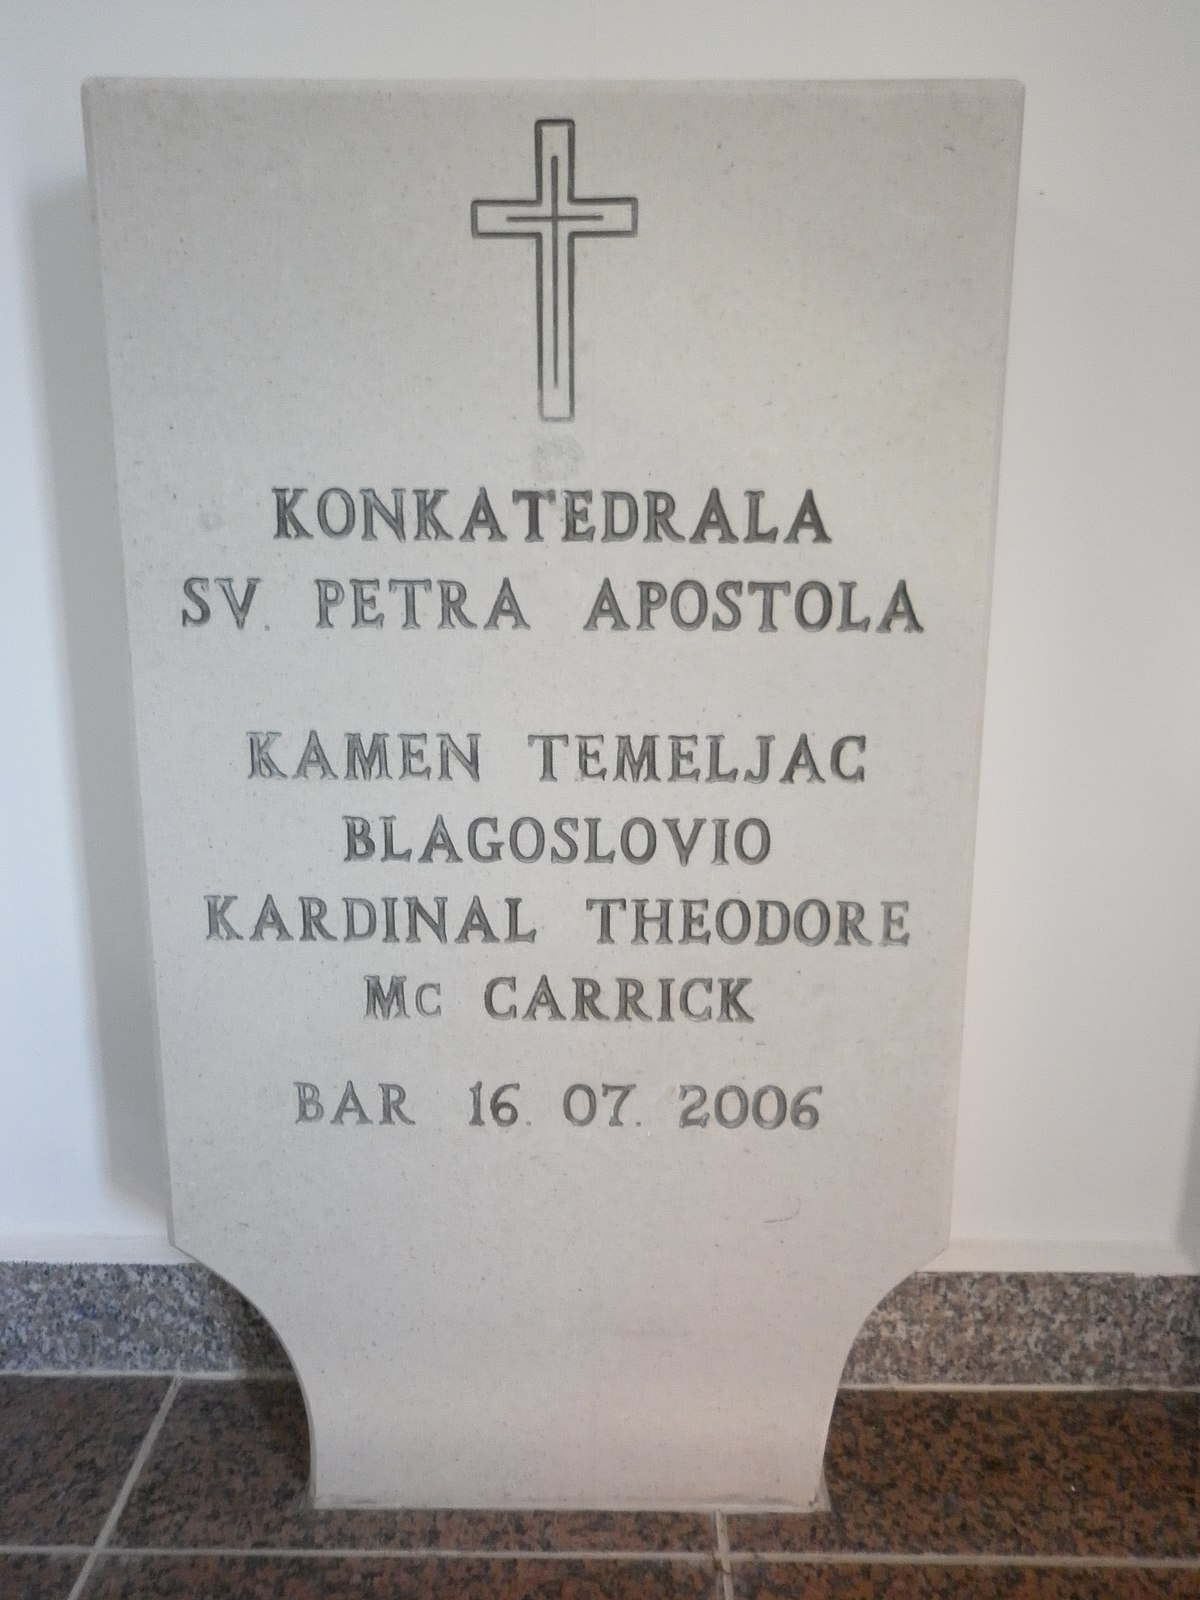 Datoteka Spomen Na Kamen Temeljac Konkatedrale U Baru Jpg Wikipedija